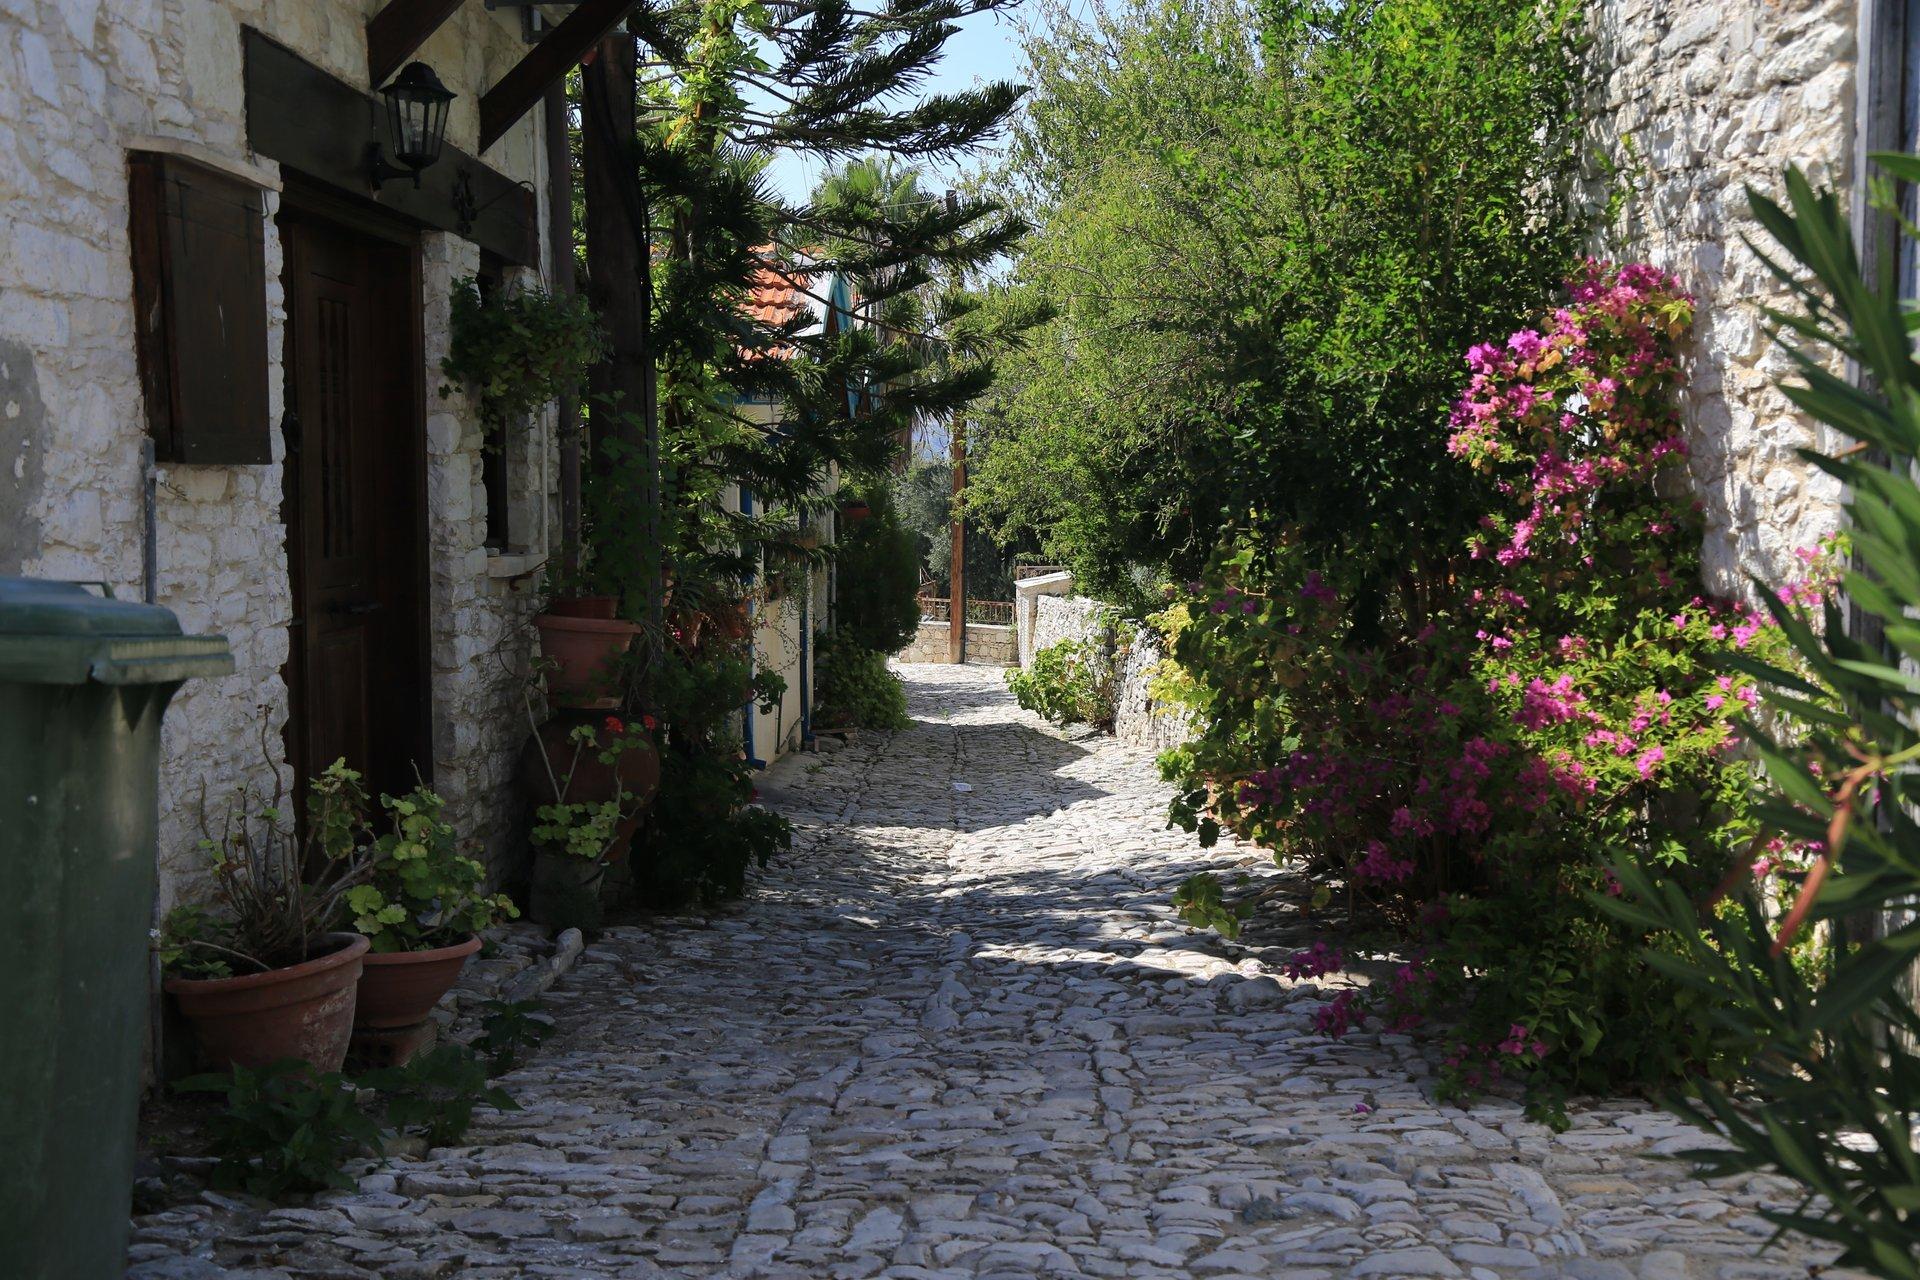 Lania, Limassol, Cyprus 2019